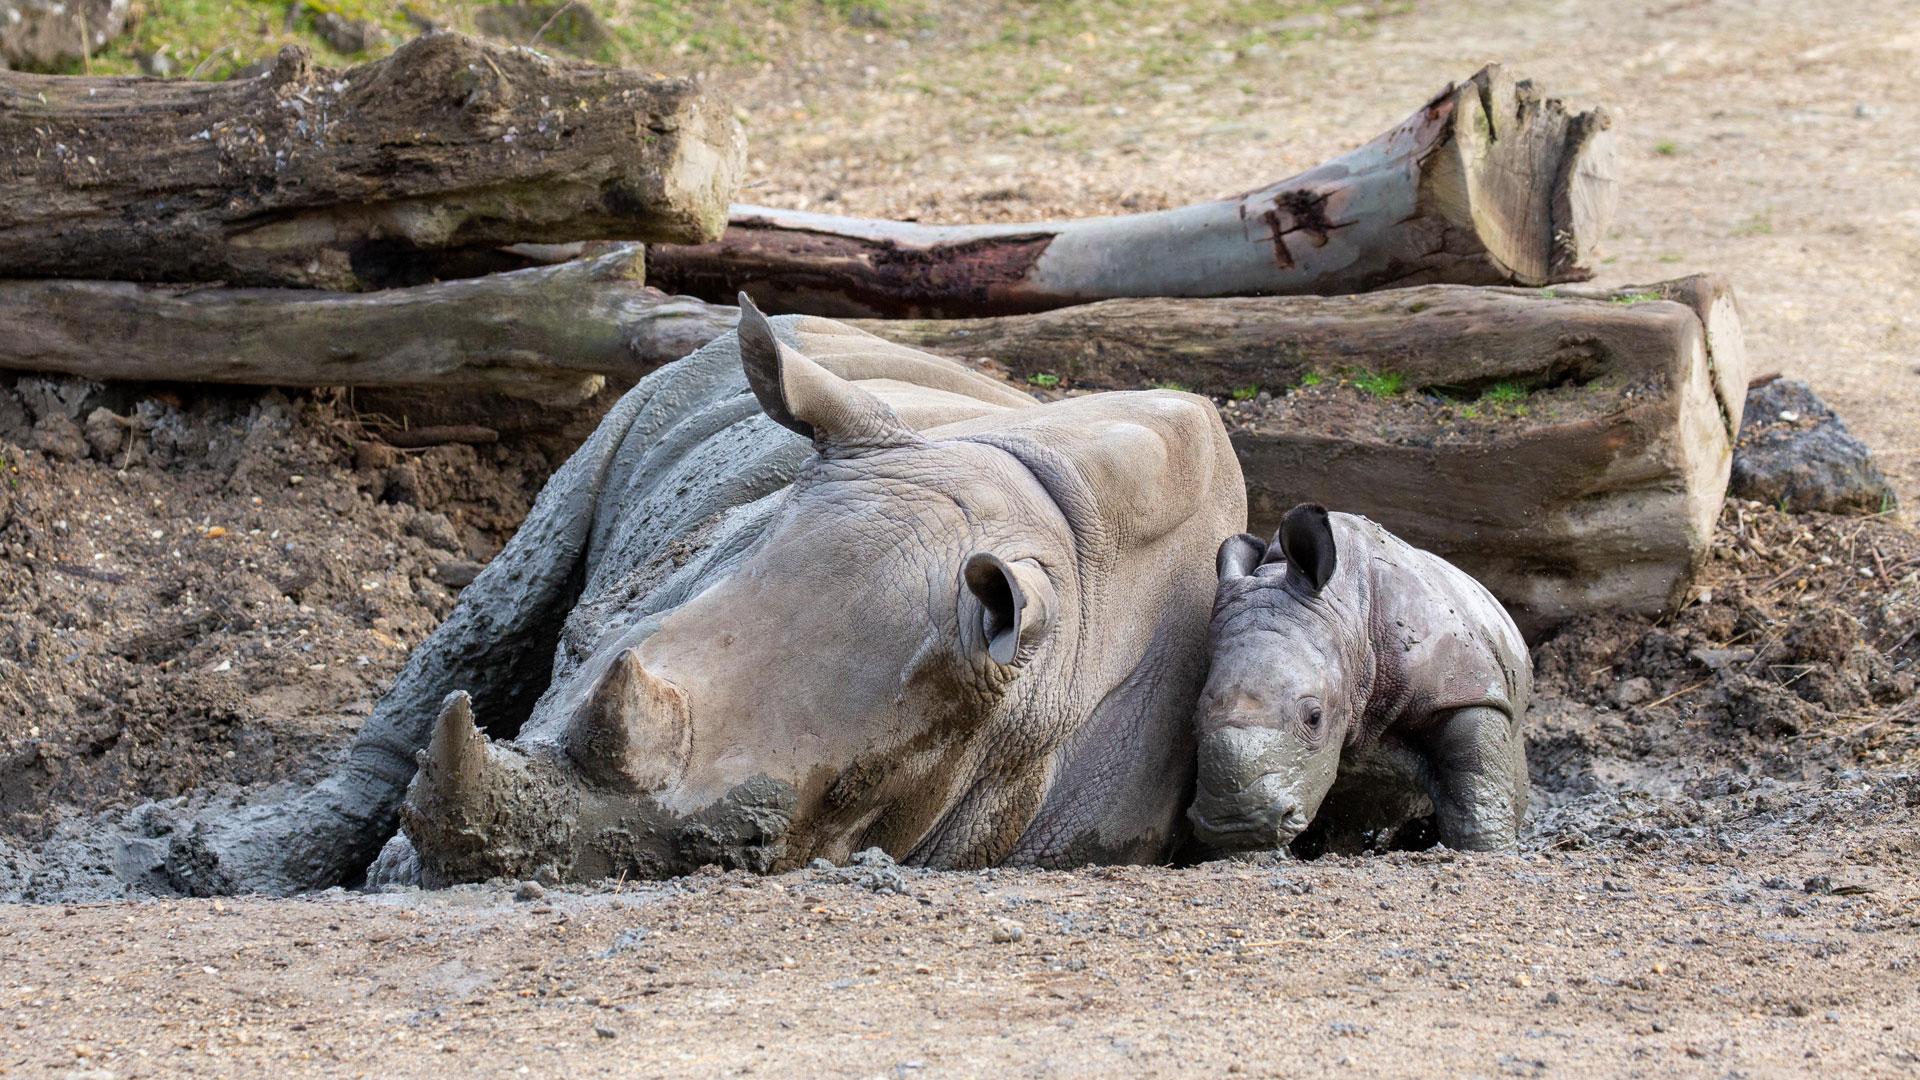 https://rfacdn.nz/zoo/assets/media/rhino-calf-in-habitat-gallery-1.jpg